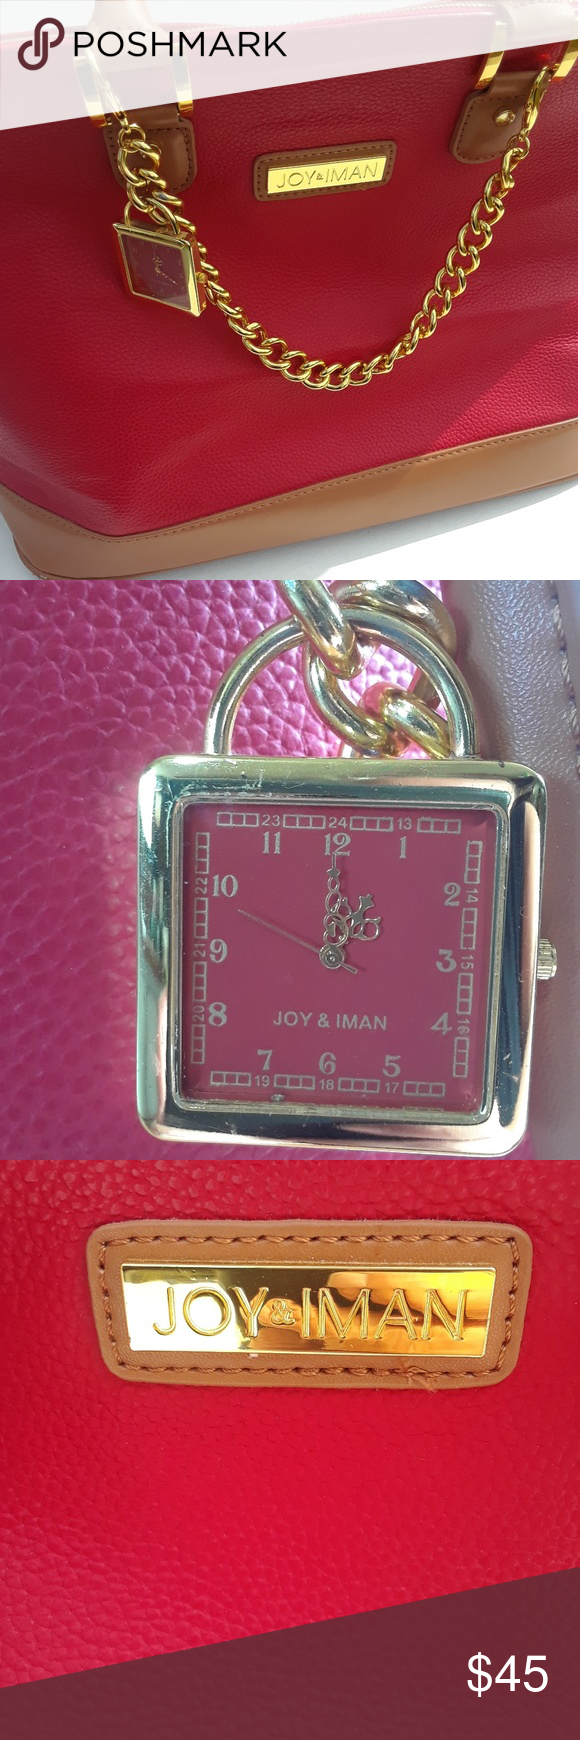 Joy and Iman purse Brand new gorgeous handbag from HSN  Very sturdy